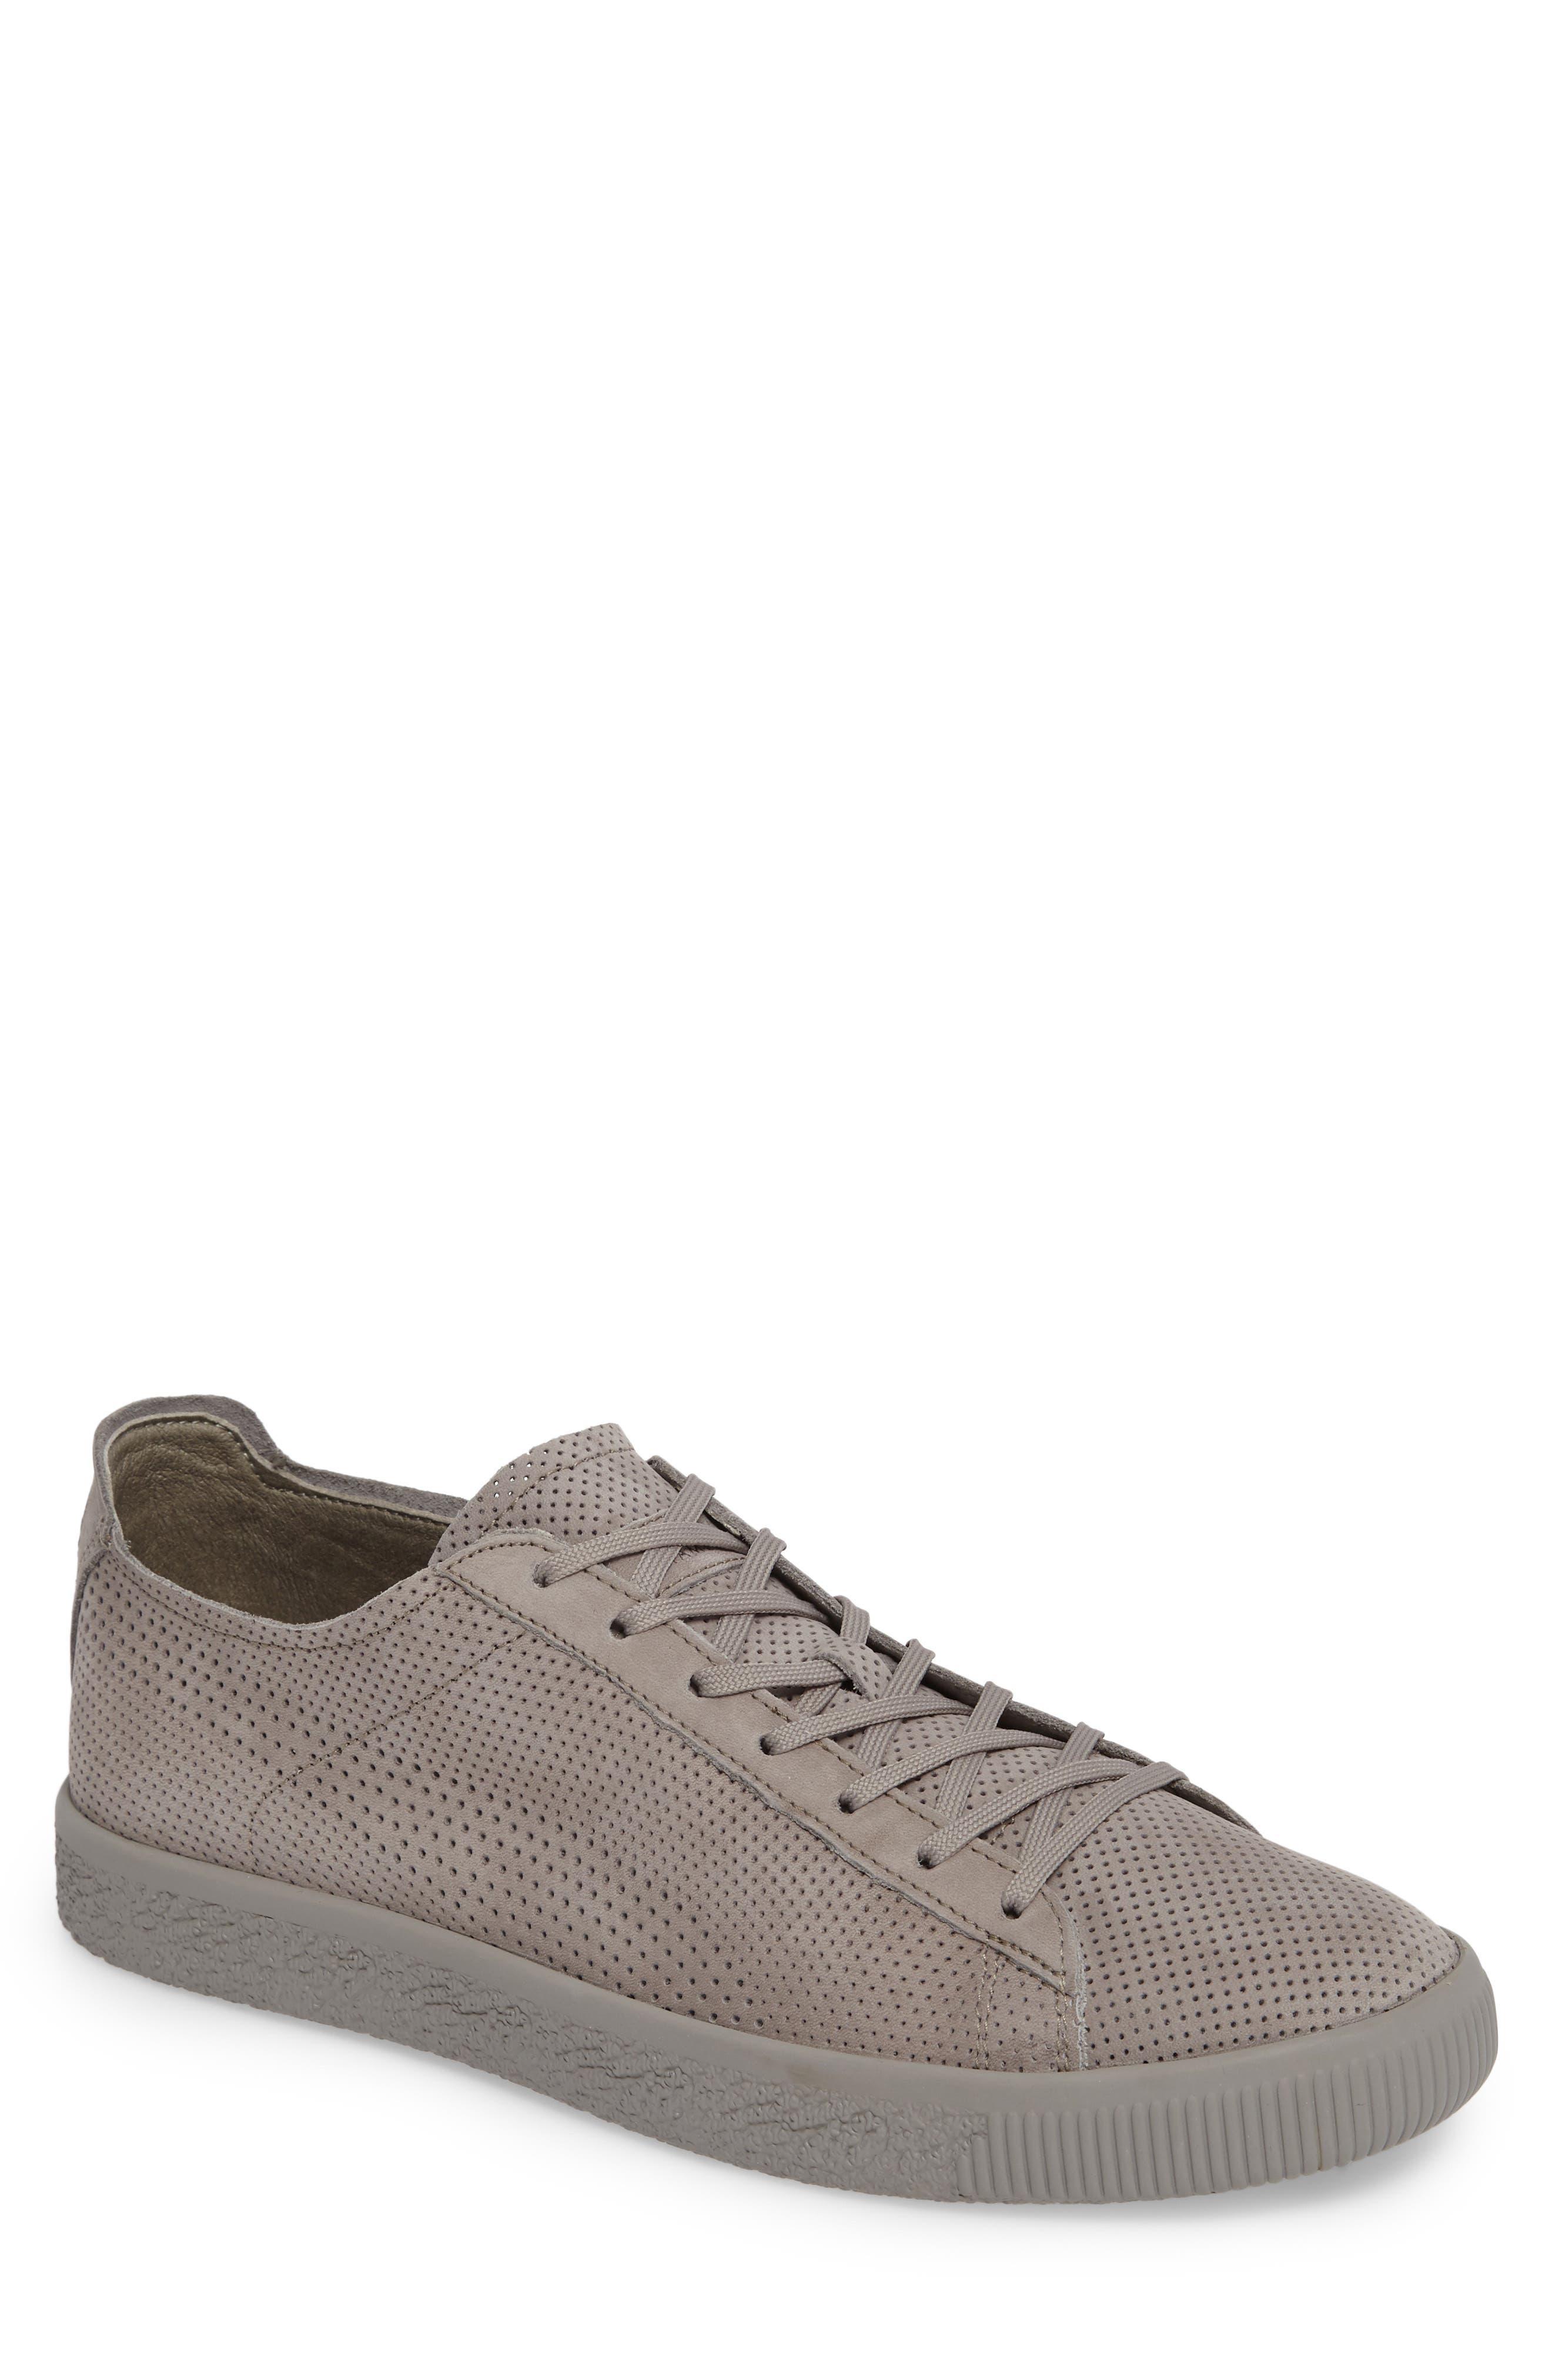 PUMA Stampd Clyde Sneaker